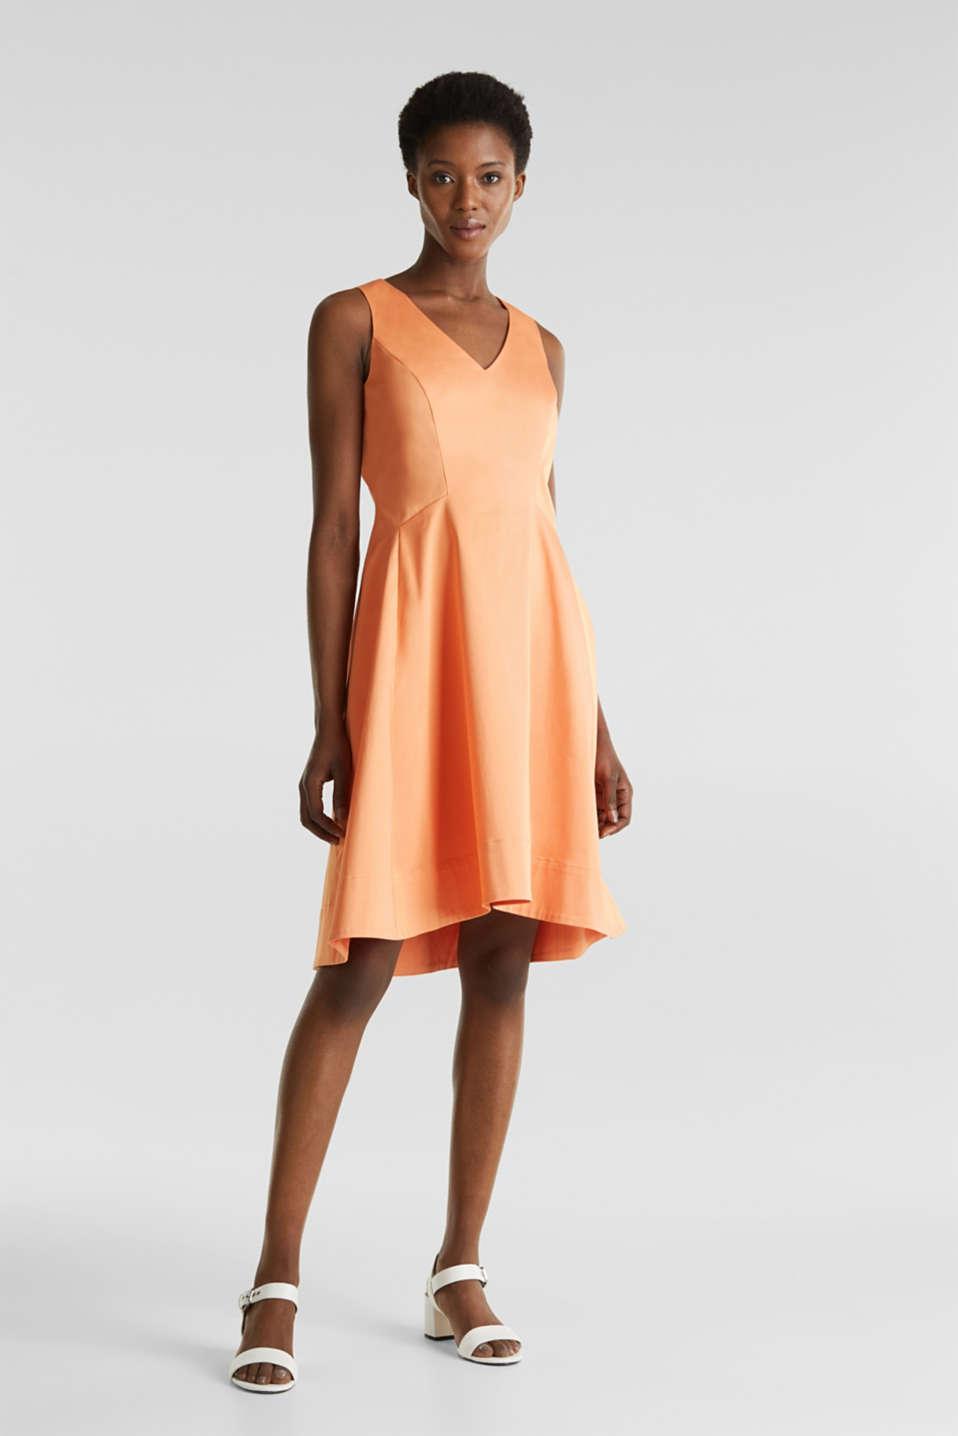 Stretch satin dress with a high-low hem, ORANGE, detail image number 1